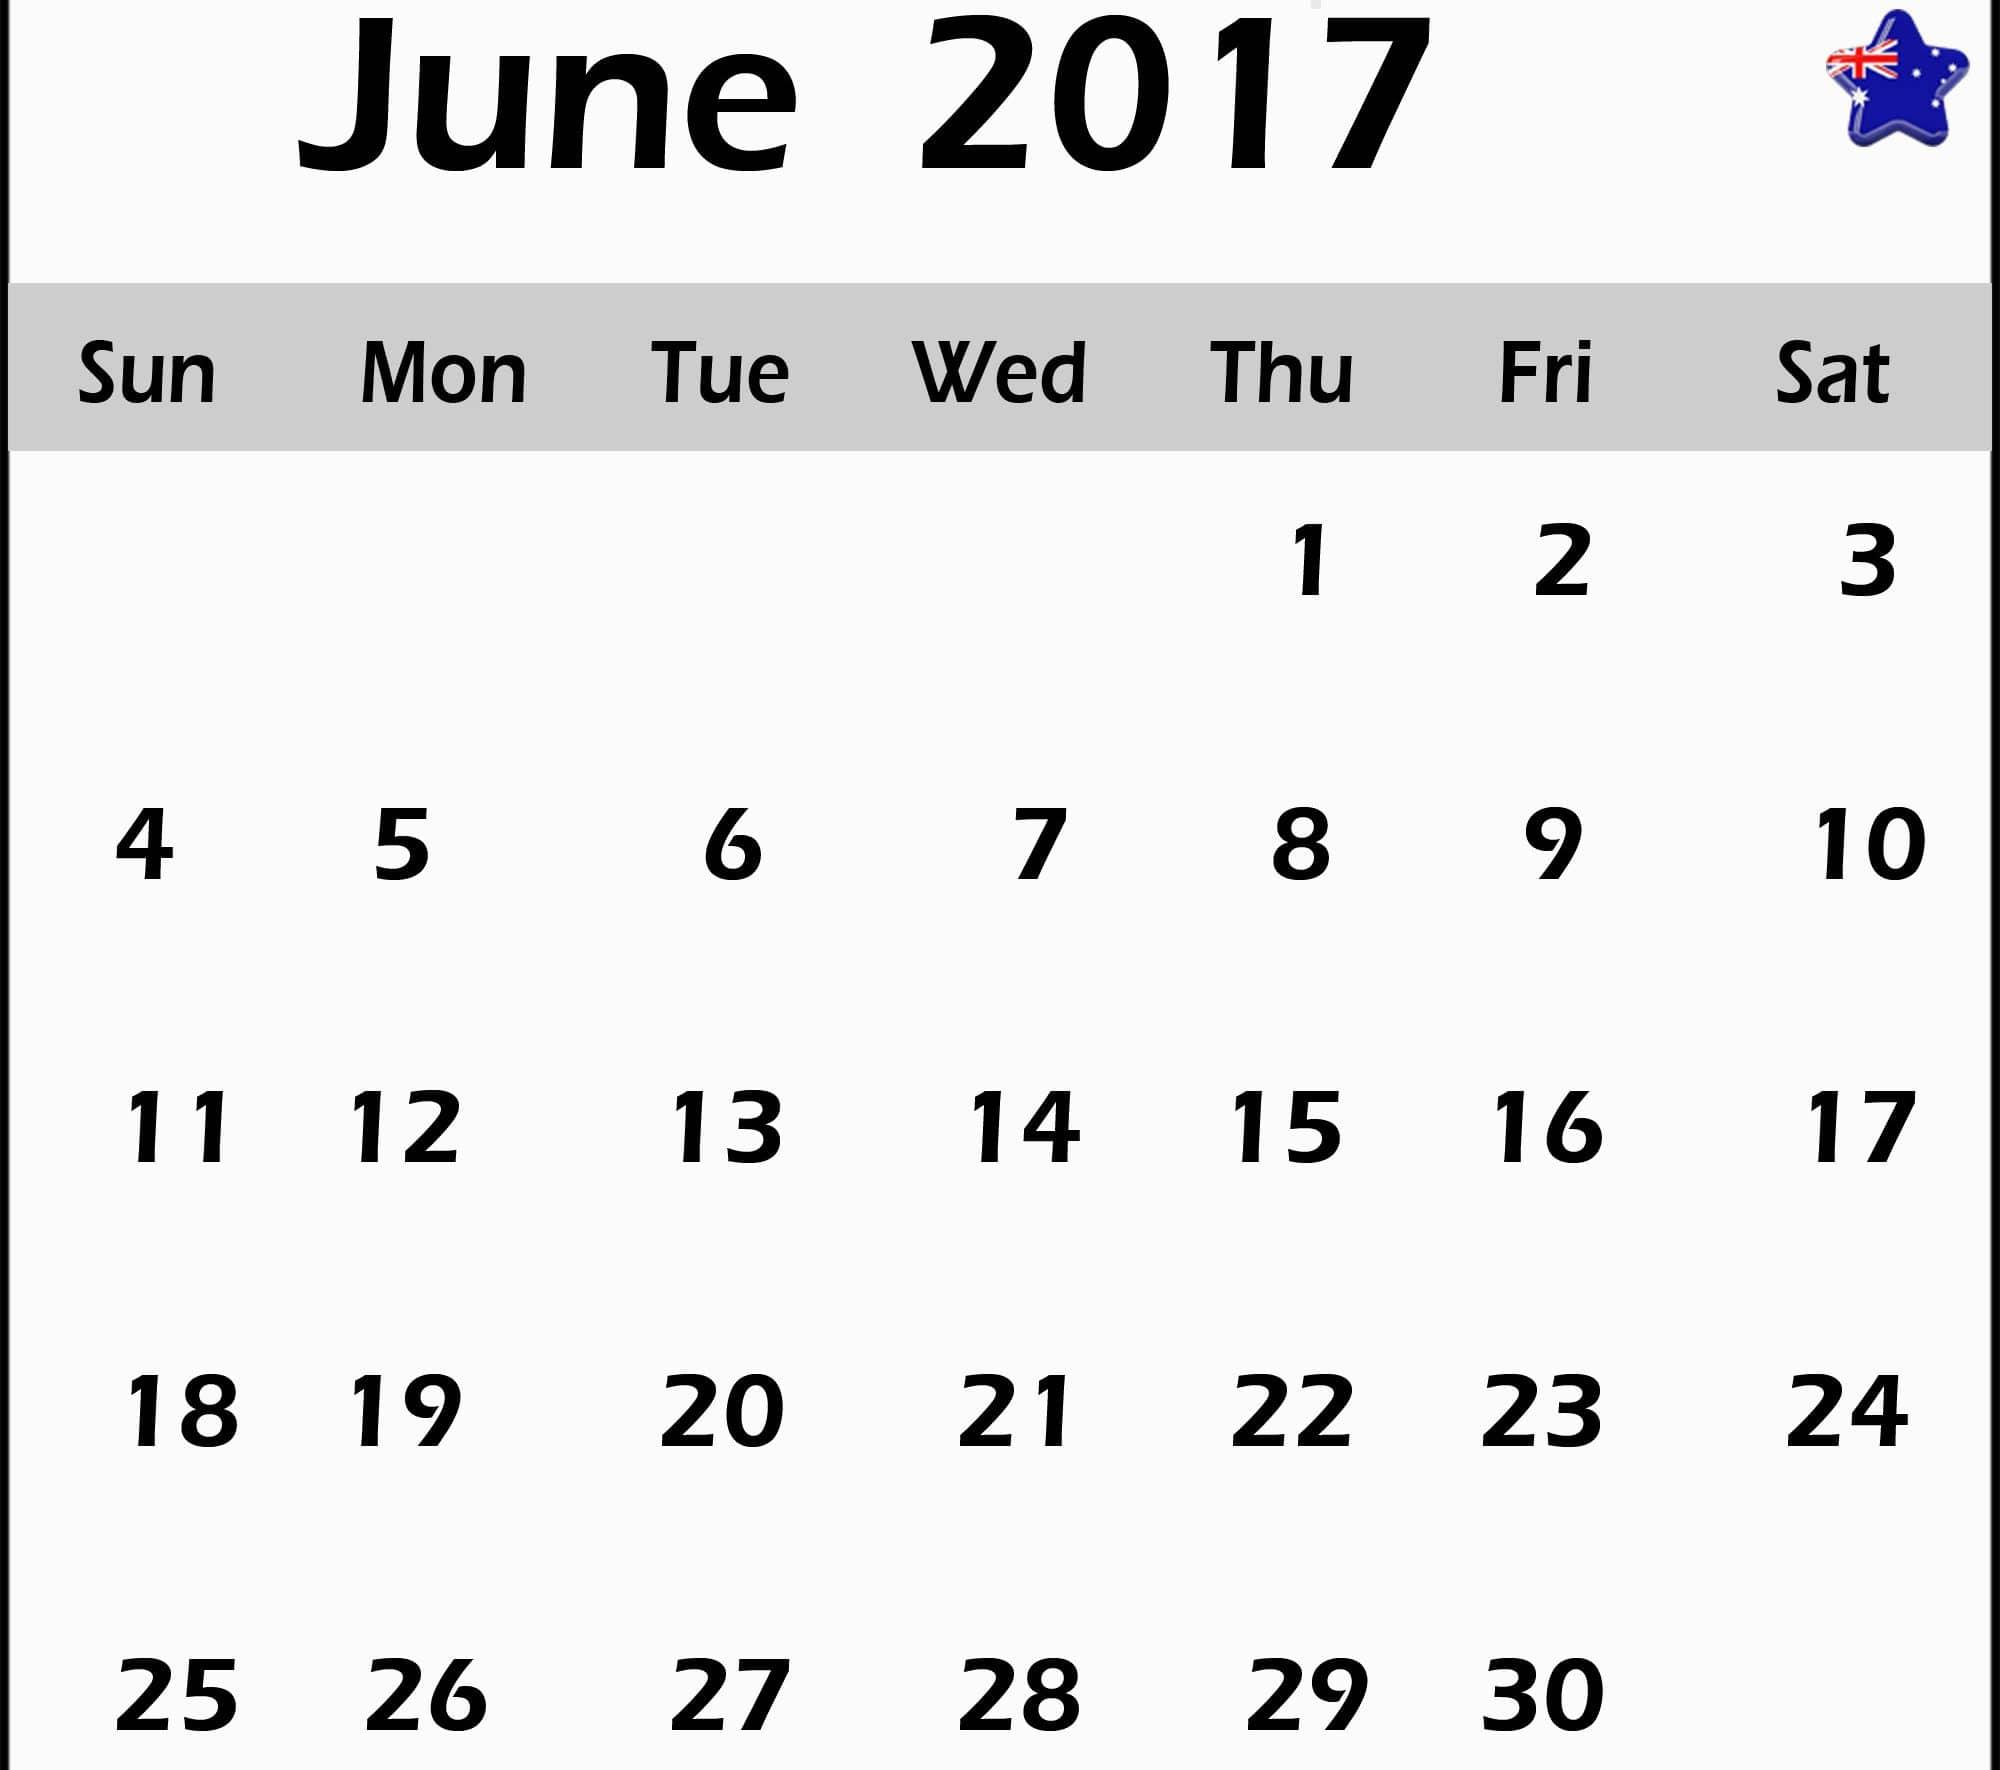 June 2017 calendar Australia